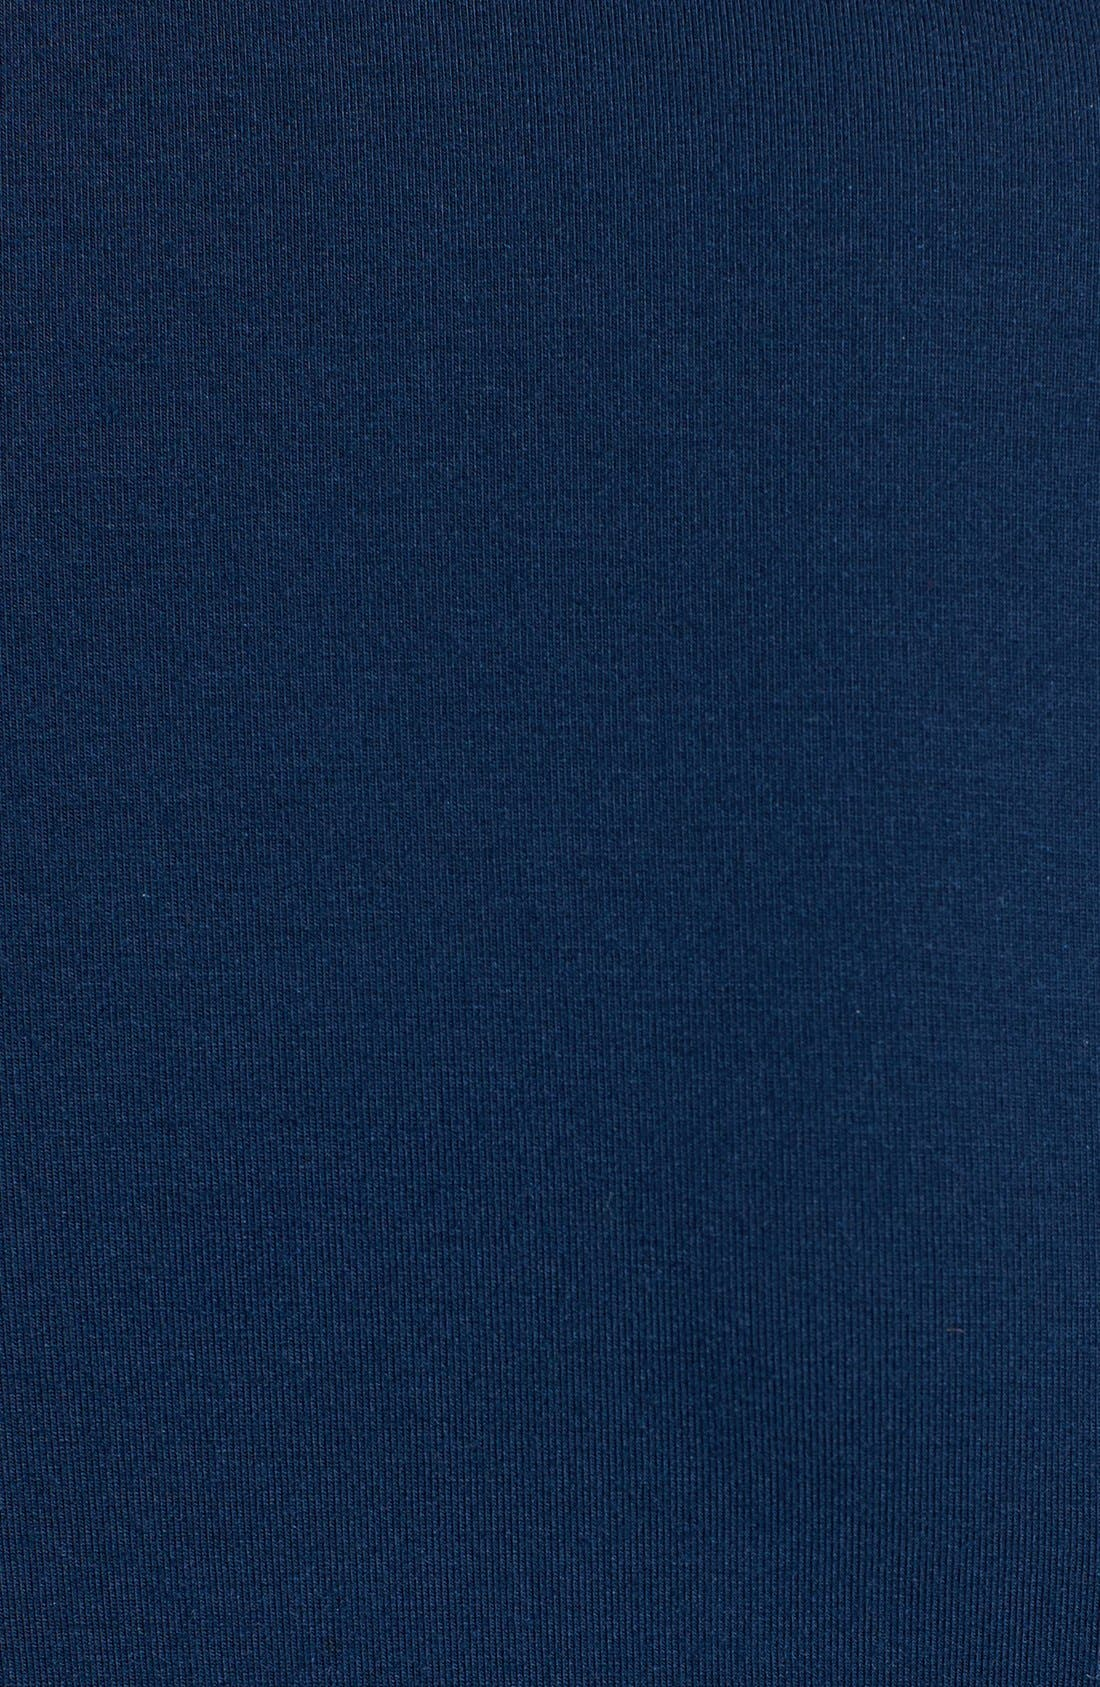 Alternate Image 3  - Eberjey 'Gisele' Jersey Tunic Sleep Shirt